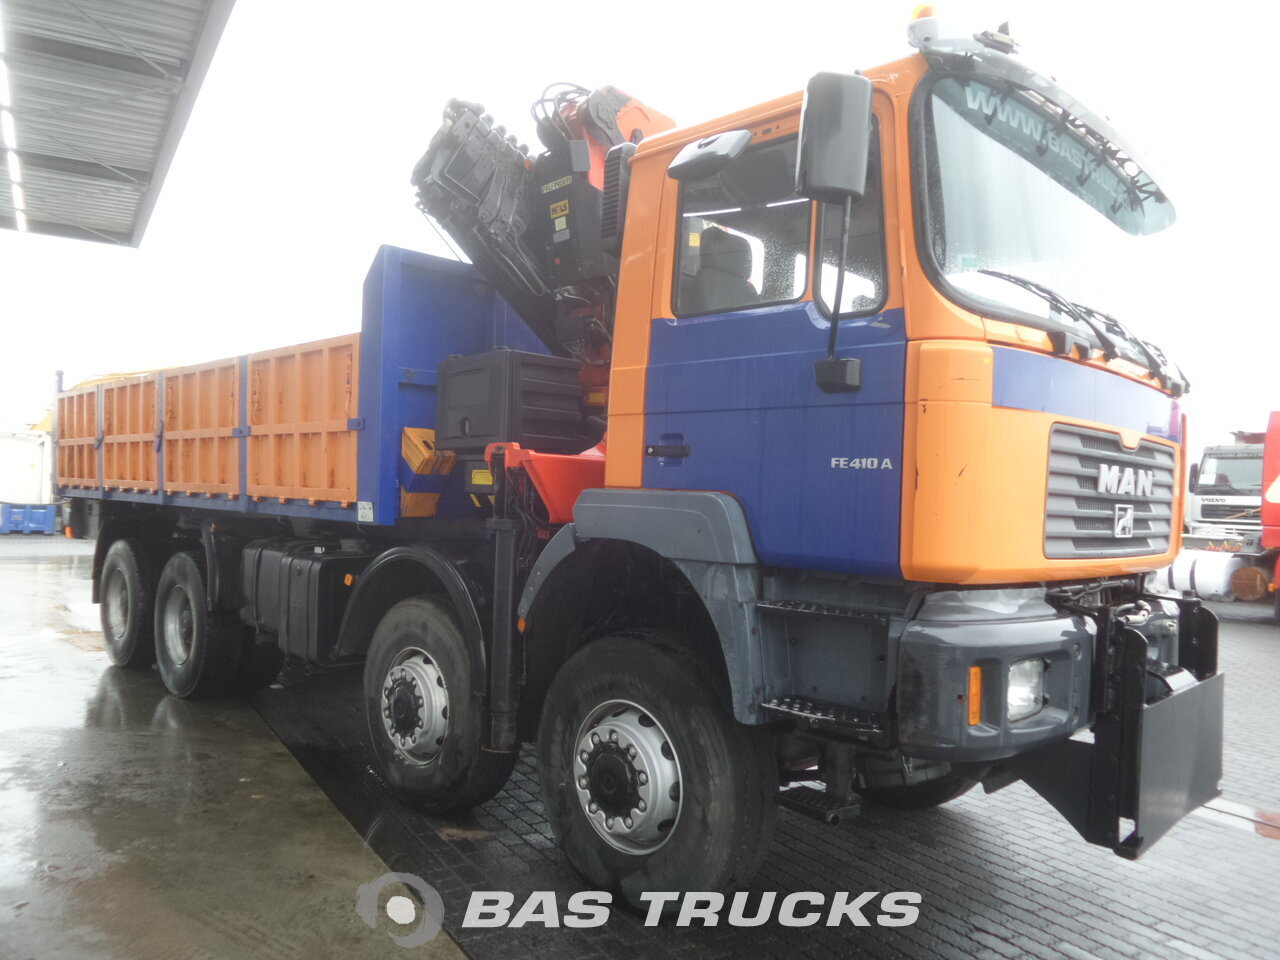 À venda em BAS Trucks: MAN 41 414 M 8x8 8X8 04/2002